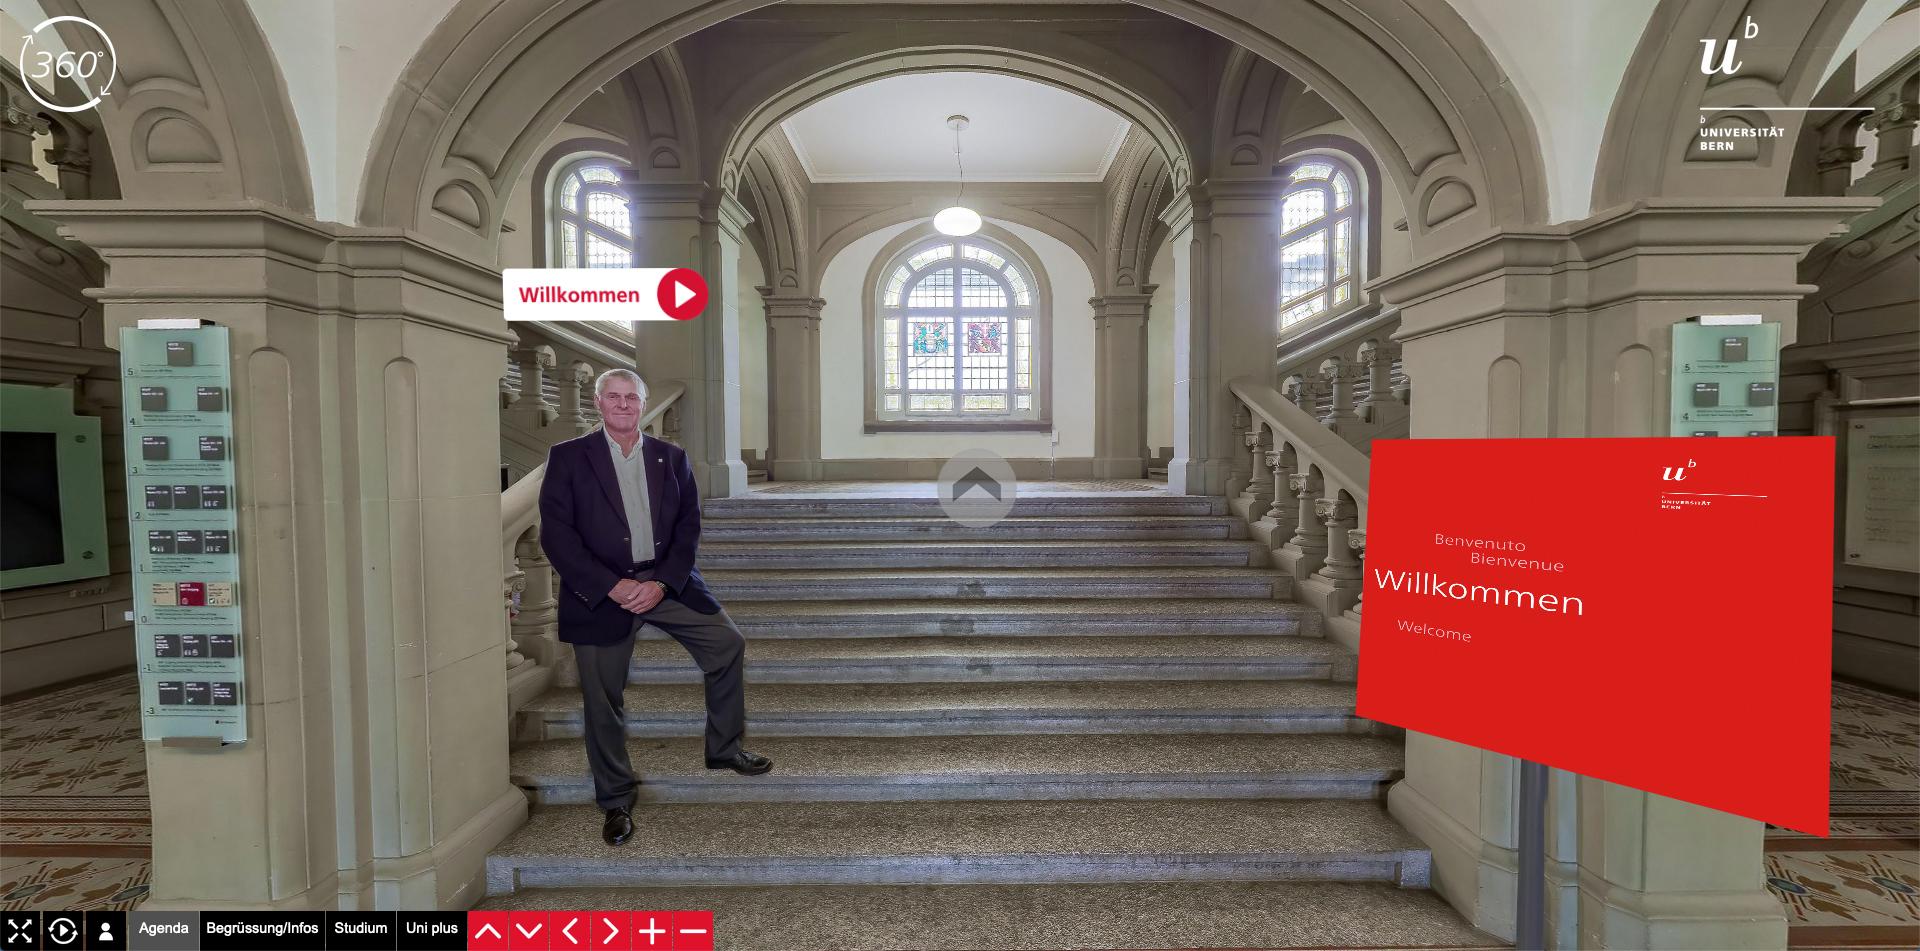 Habegger_Universitaet_Bern_Plattform